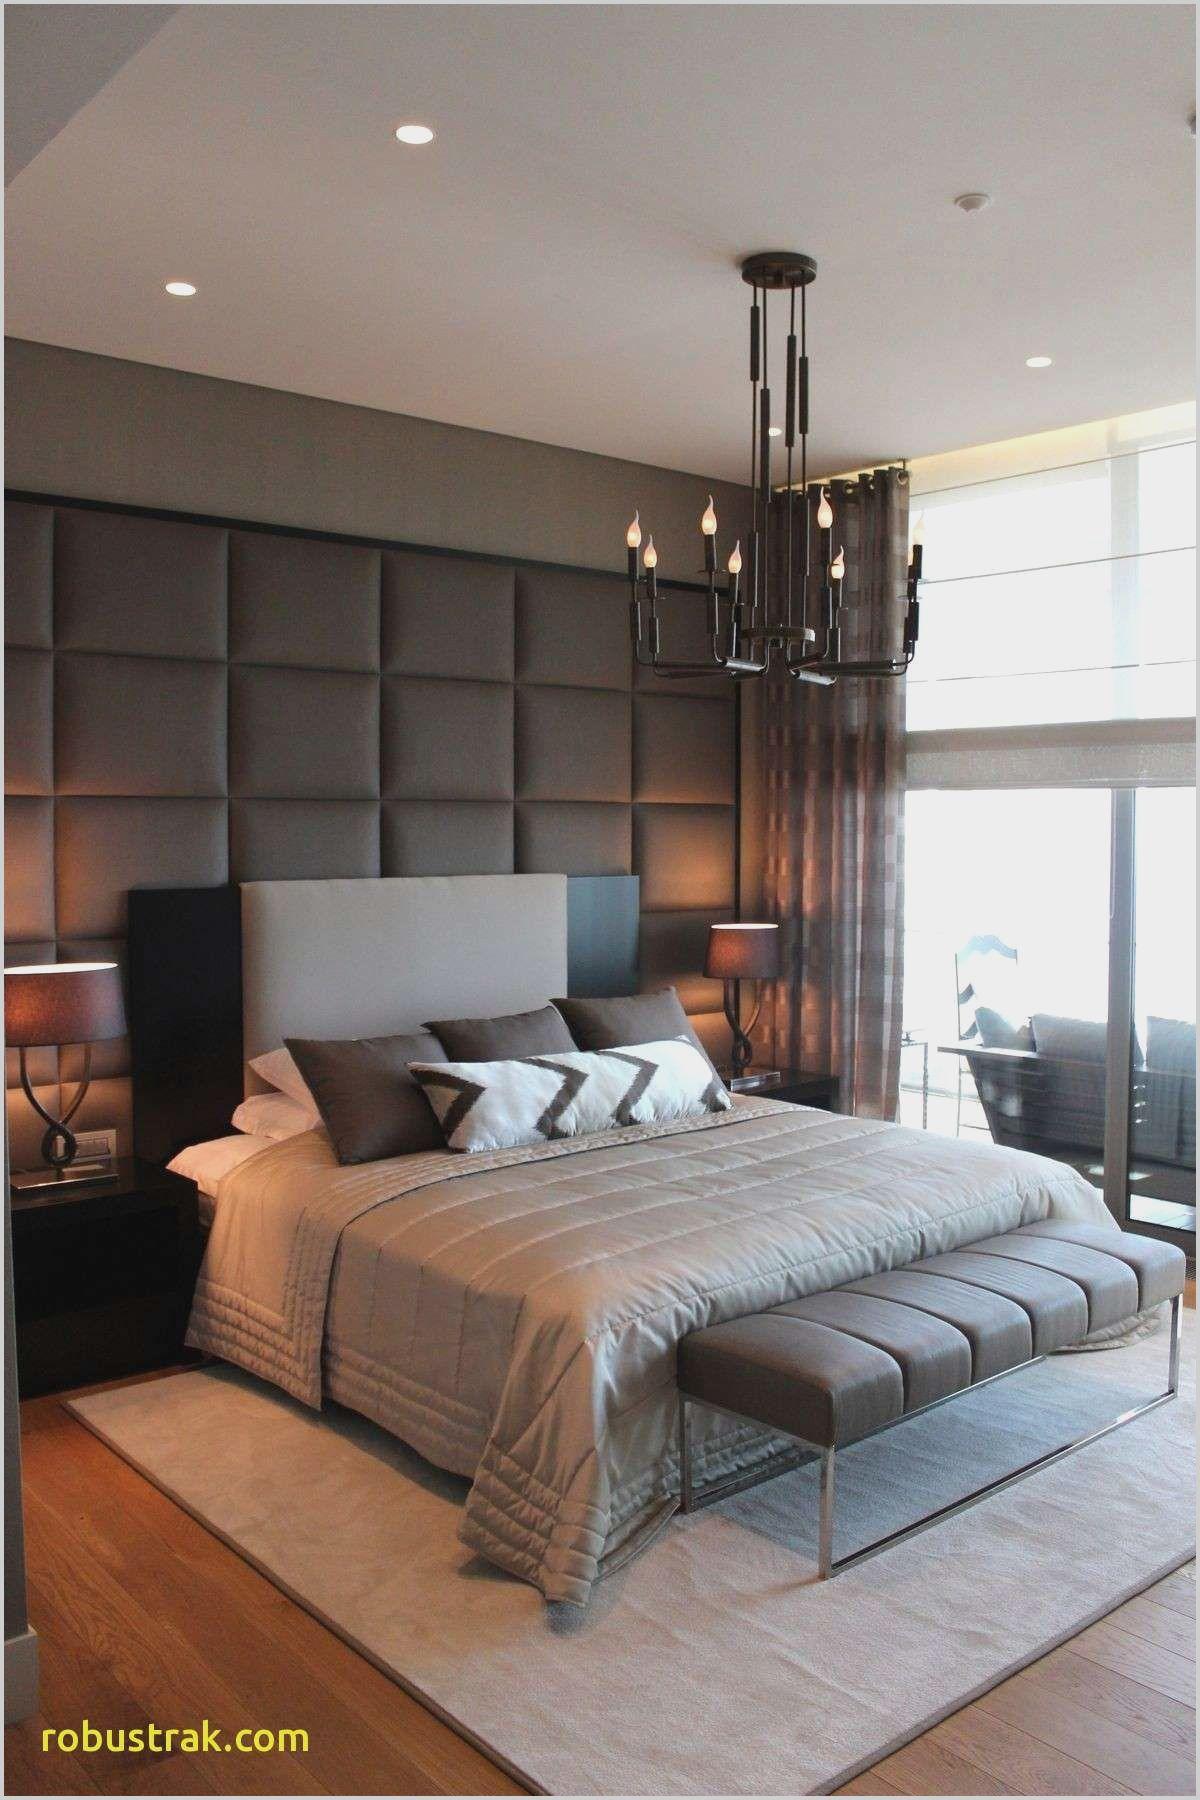 Medium Size Bedroom Design In 2020 With Images Luxury Bedroom